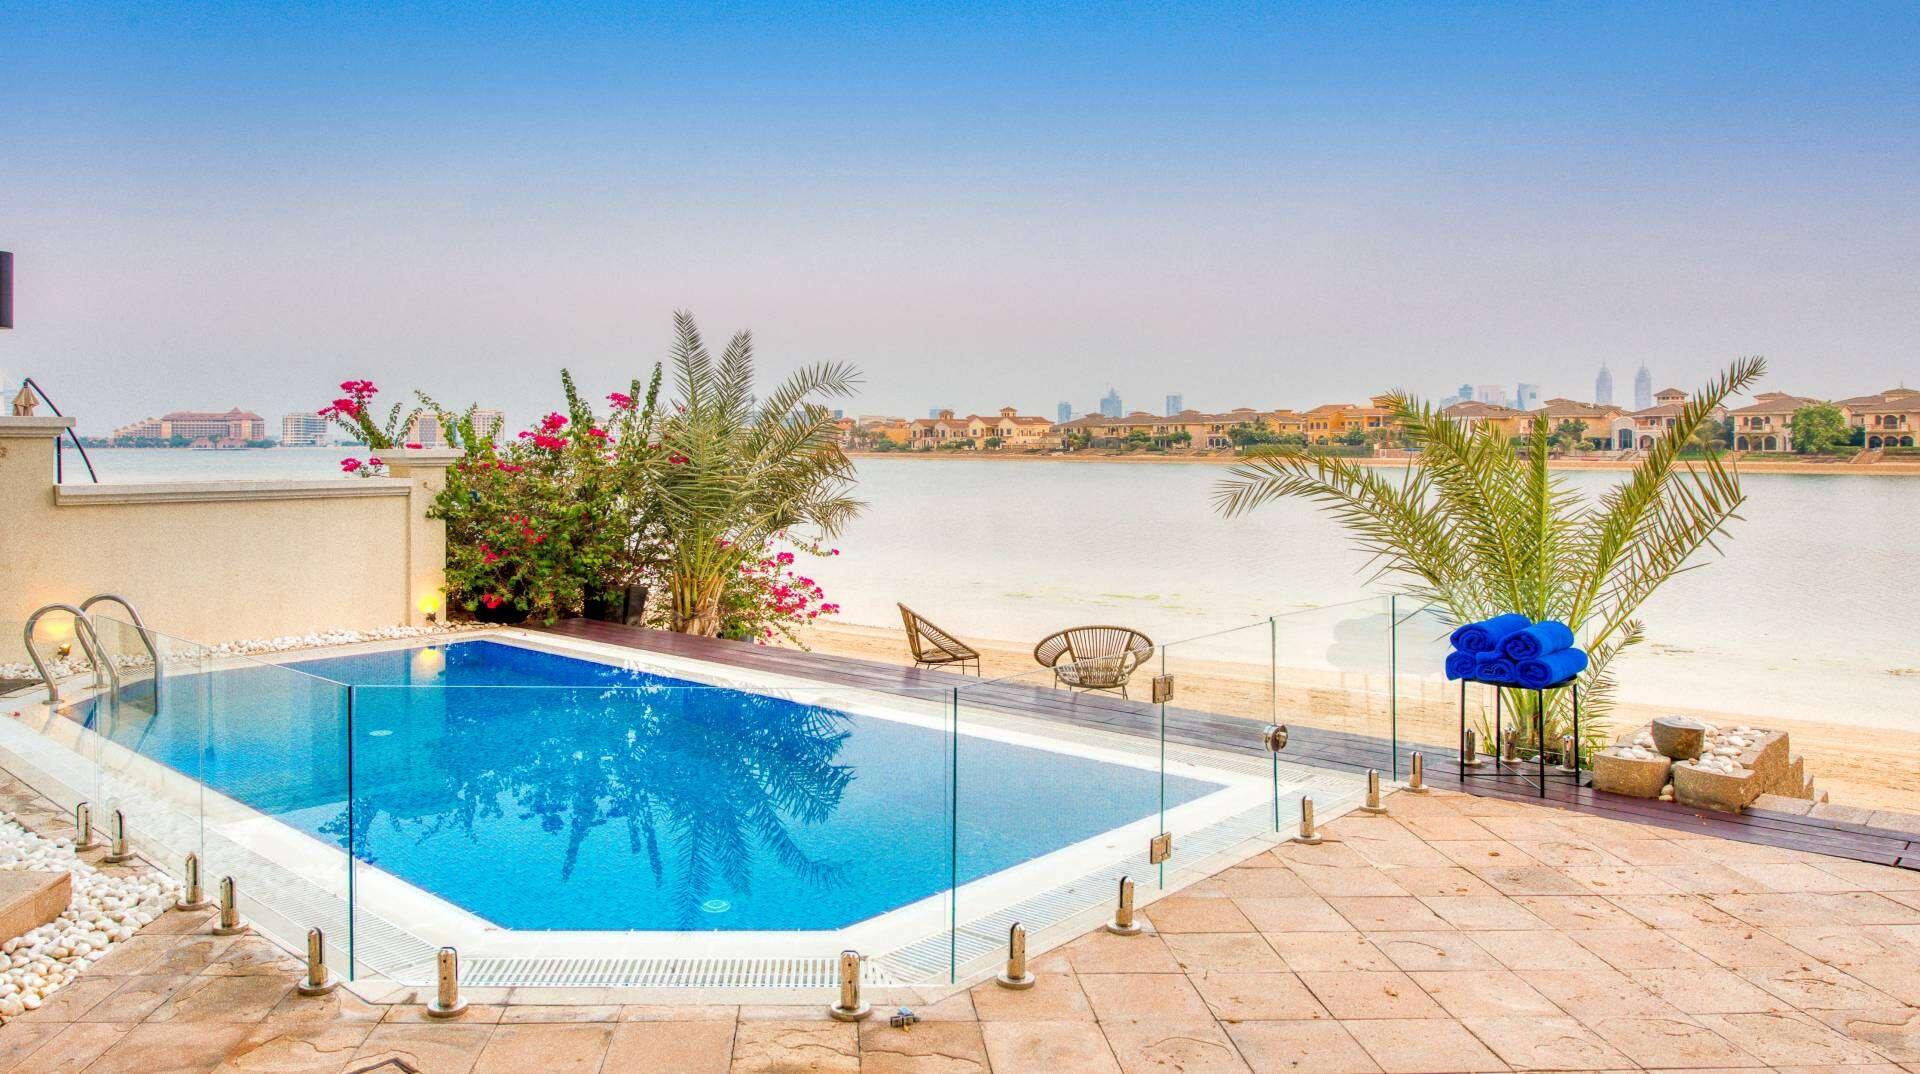 Middle east - United arabemirates - Dubai - Palm Jumeirah 67 - Image 1/23